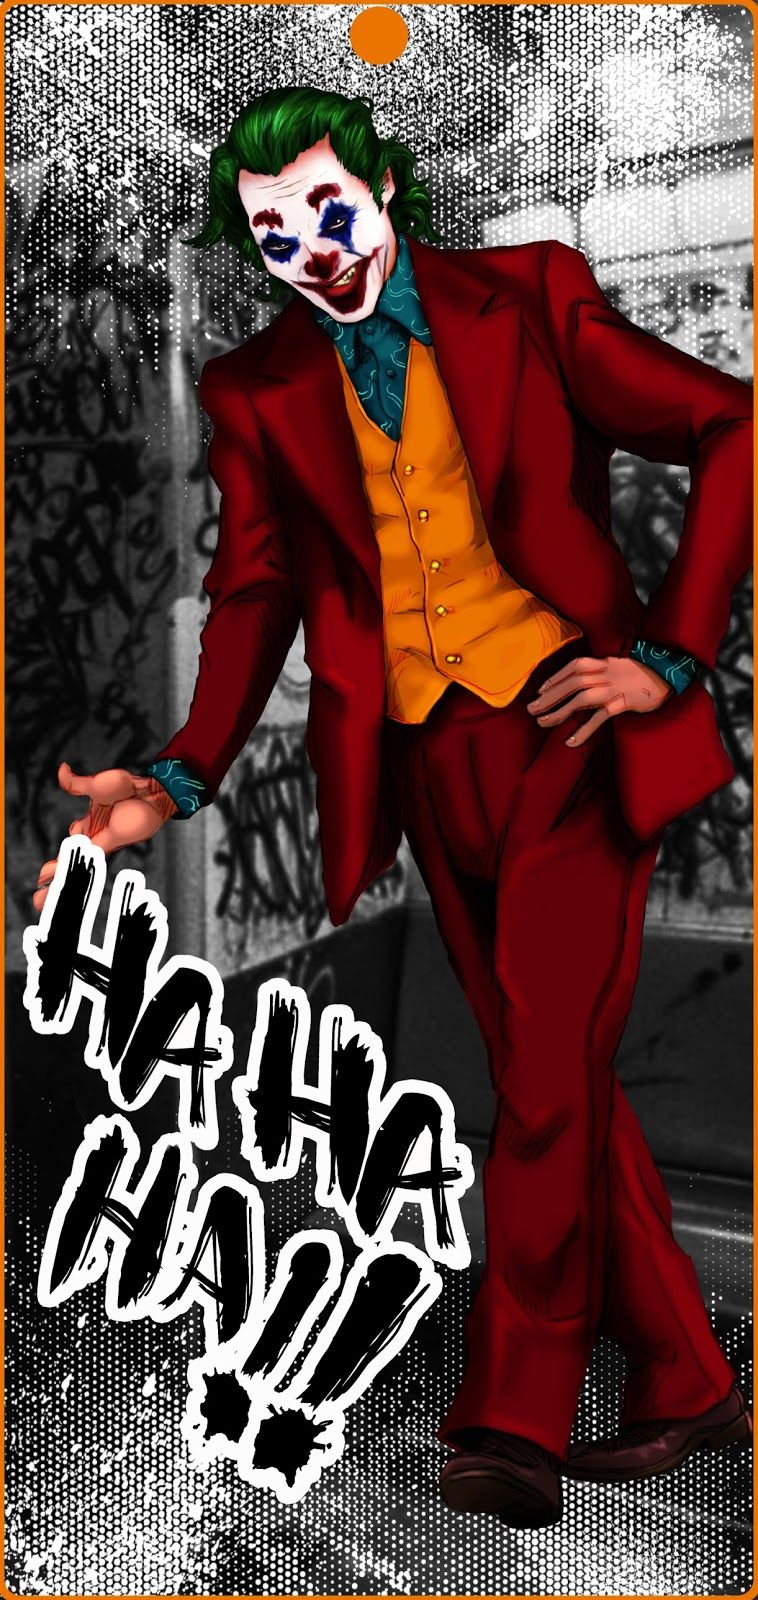 4k Amoled Wallpapers Download Joker 2019 Joker Wallpapers Joker Iphone Wallpaper 4k Amoled Wallpaper